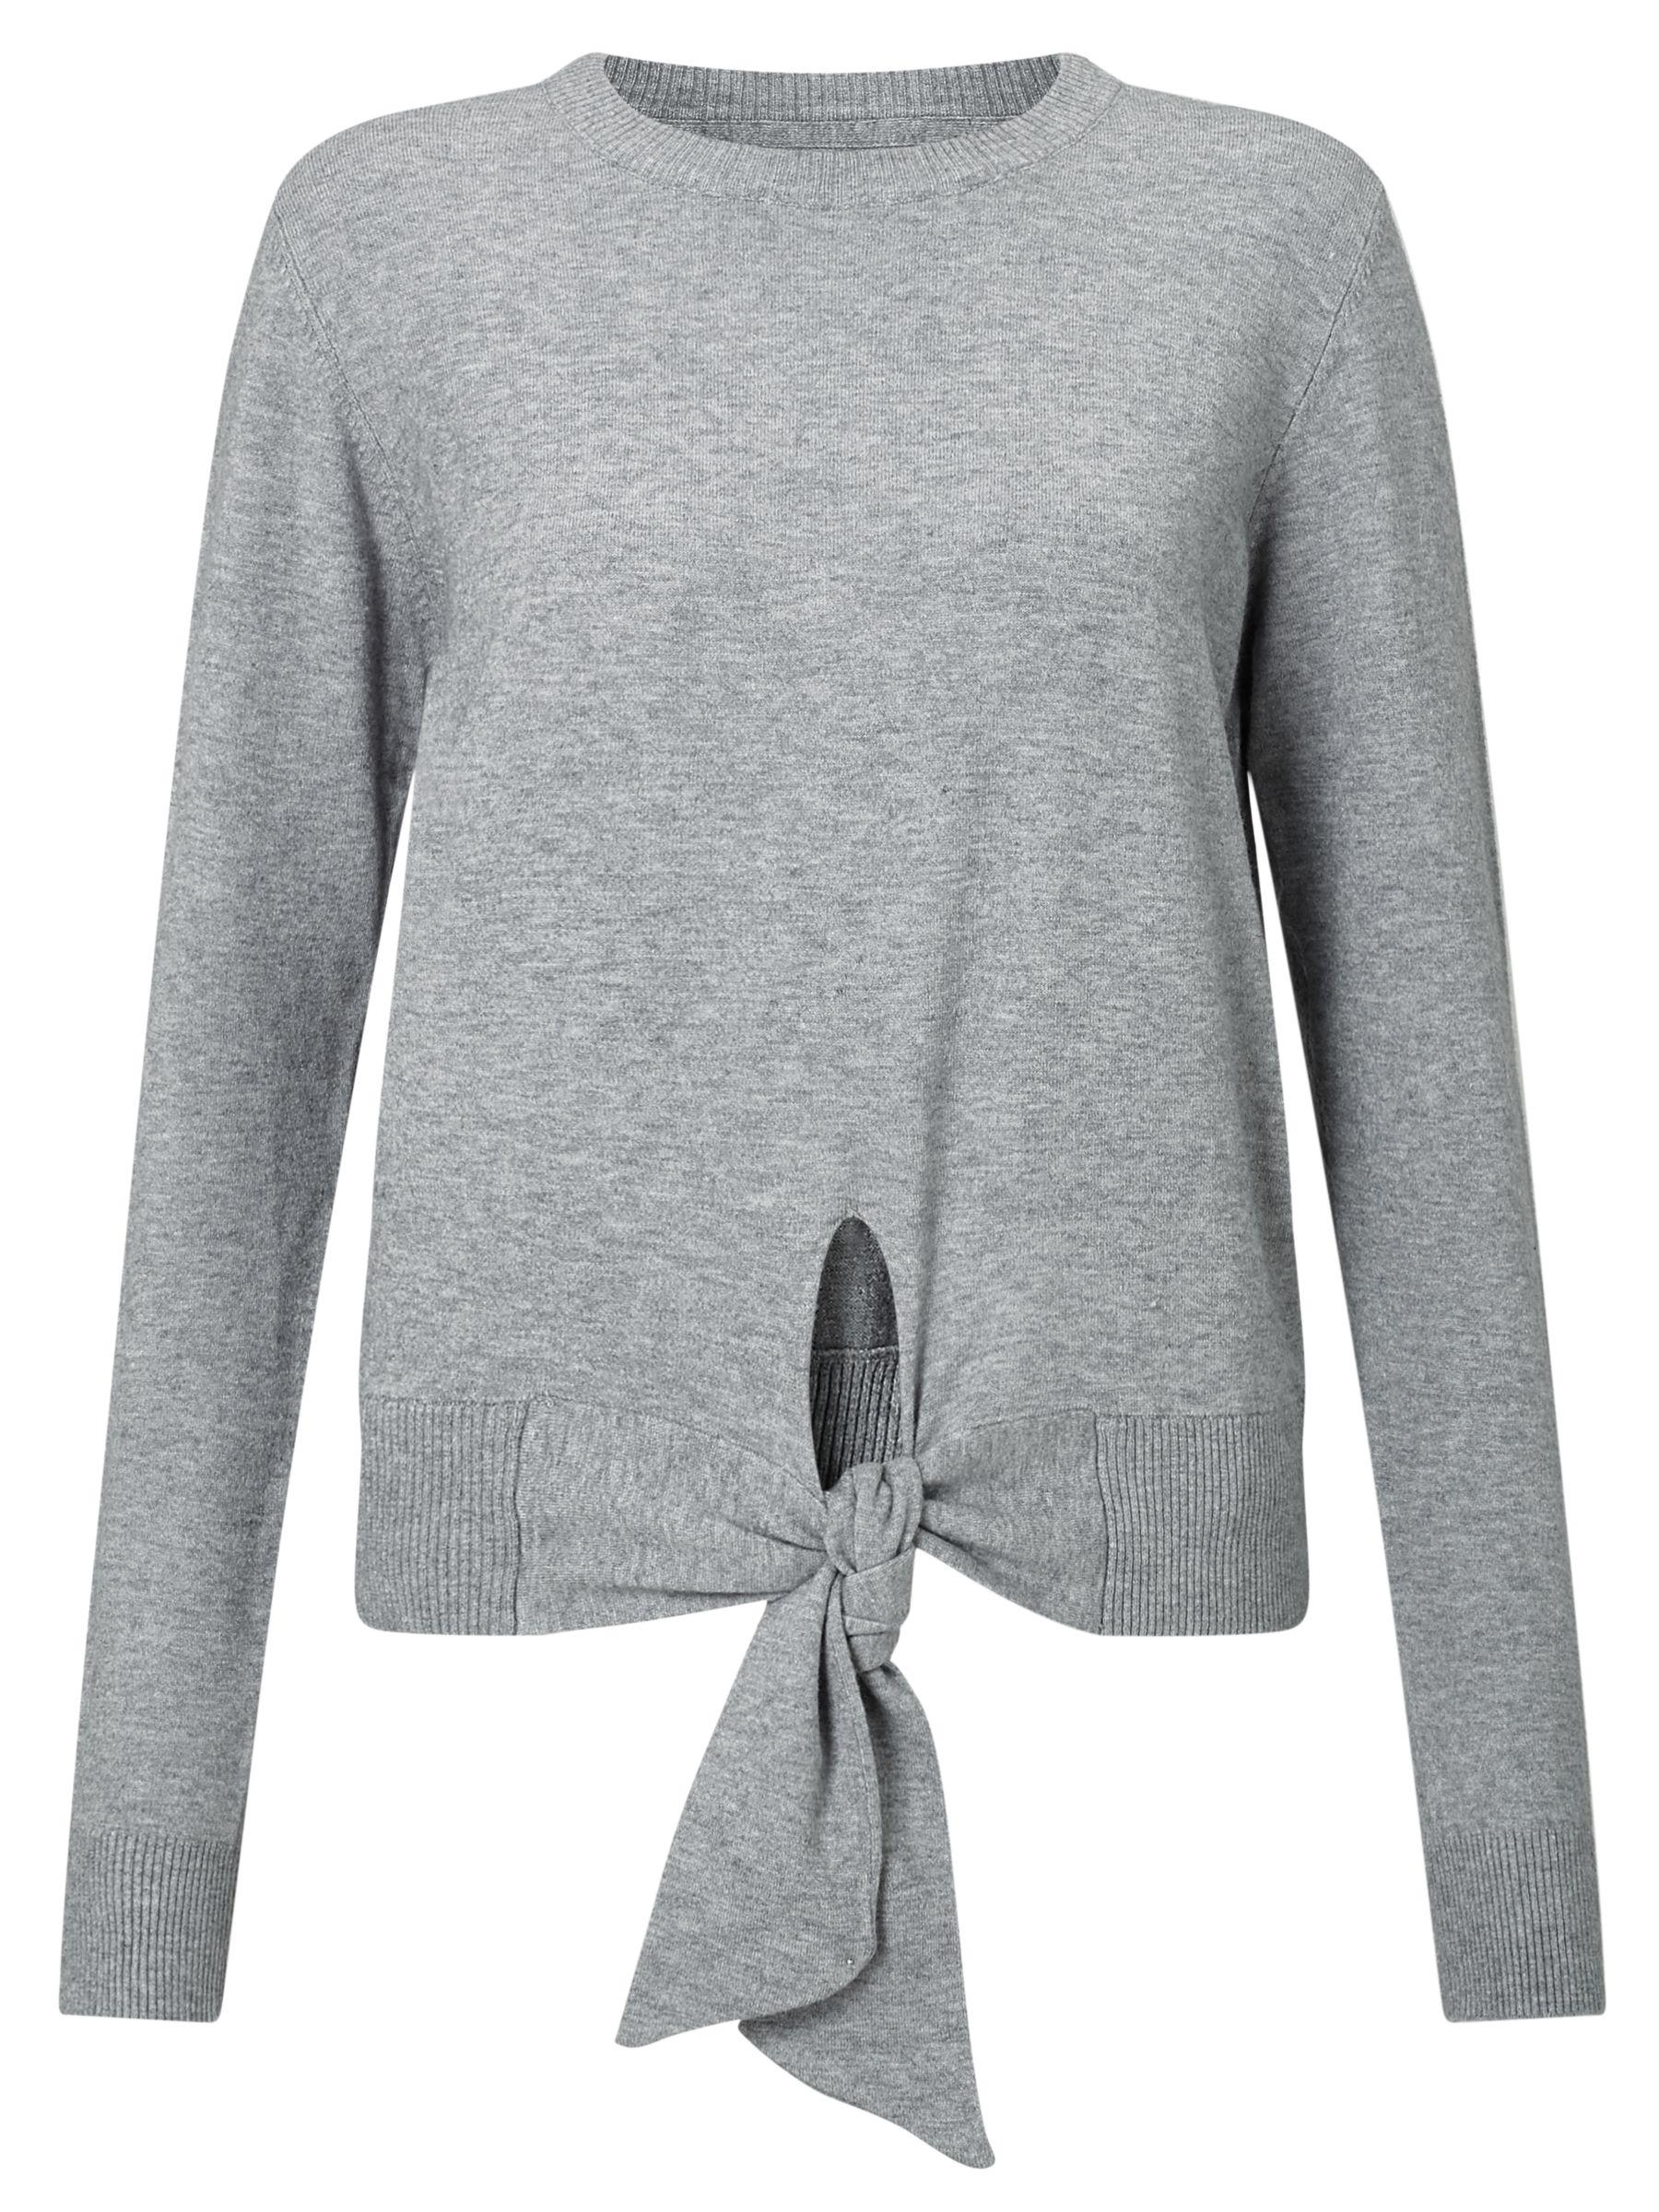 Minimum Minimum Irela Jumper, Light Grey Melange